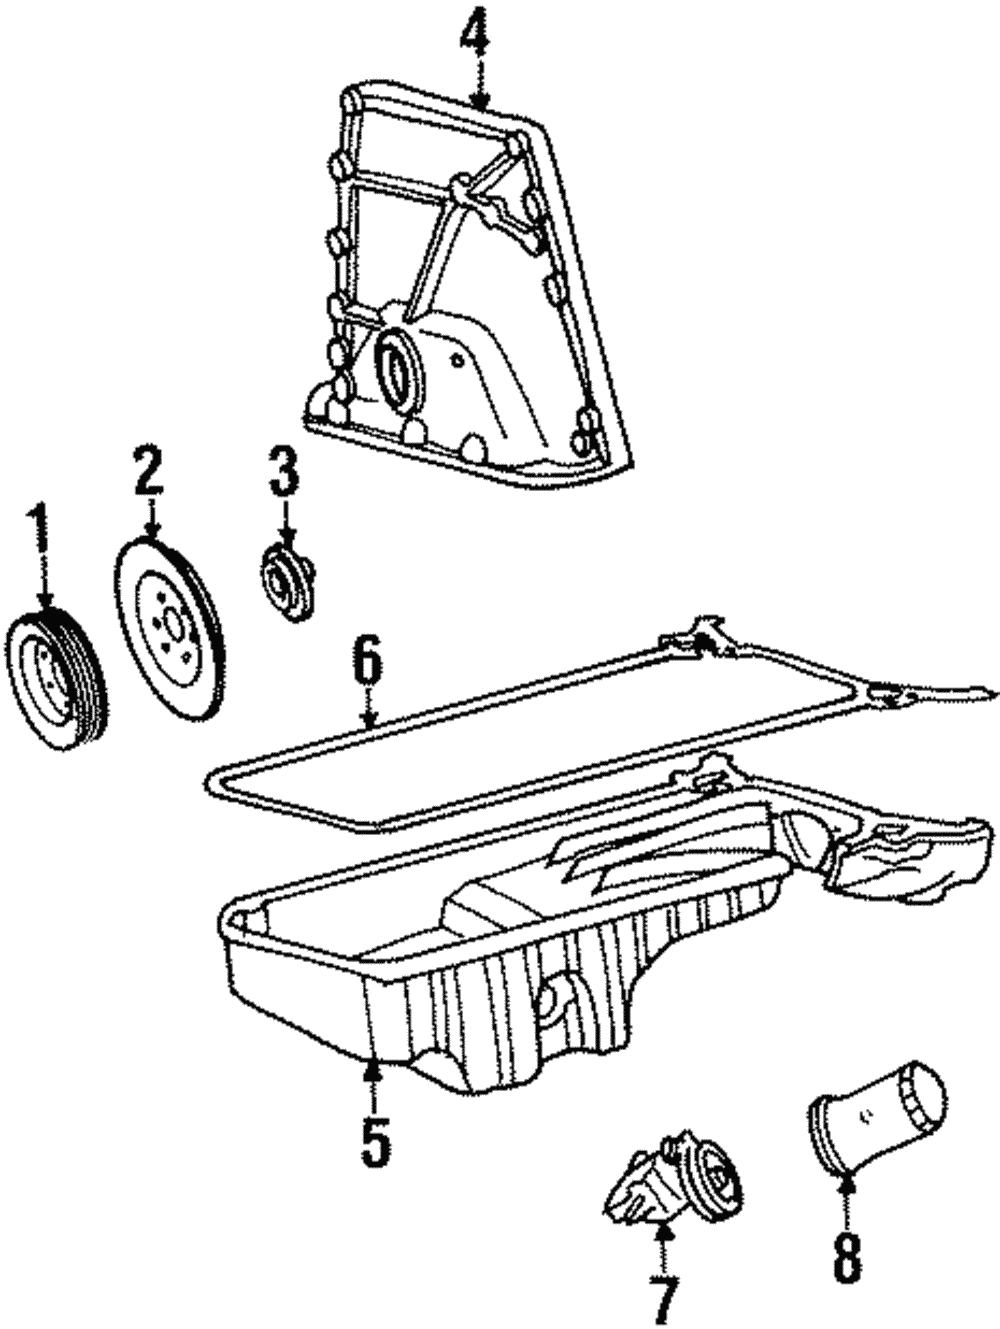 hight resolution of 1981 mercedes benz 300d wiring diagram database 1981 300d wiring diagram